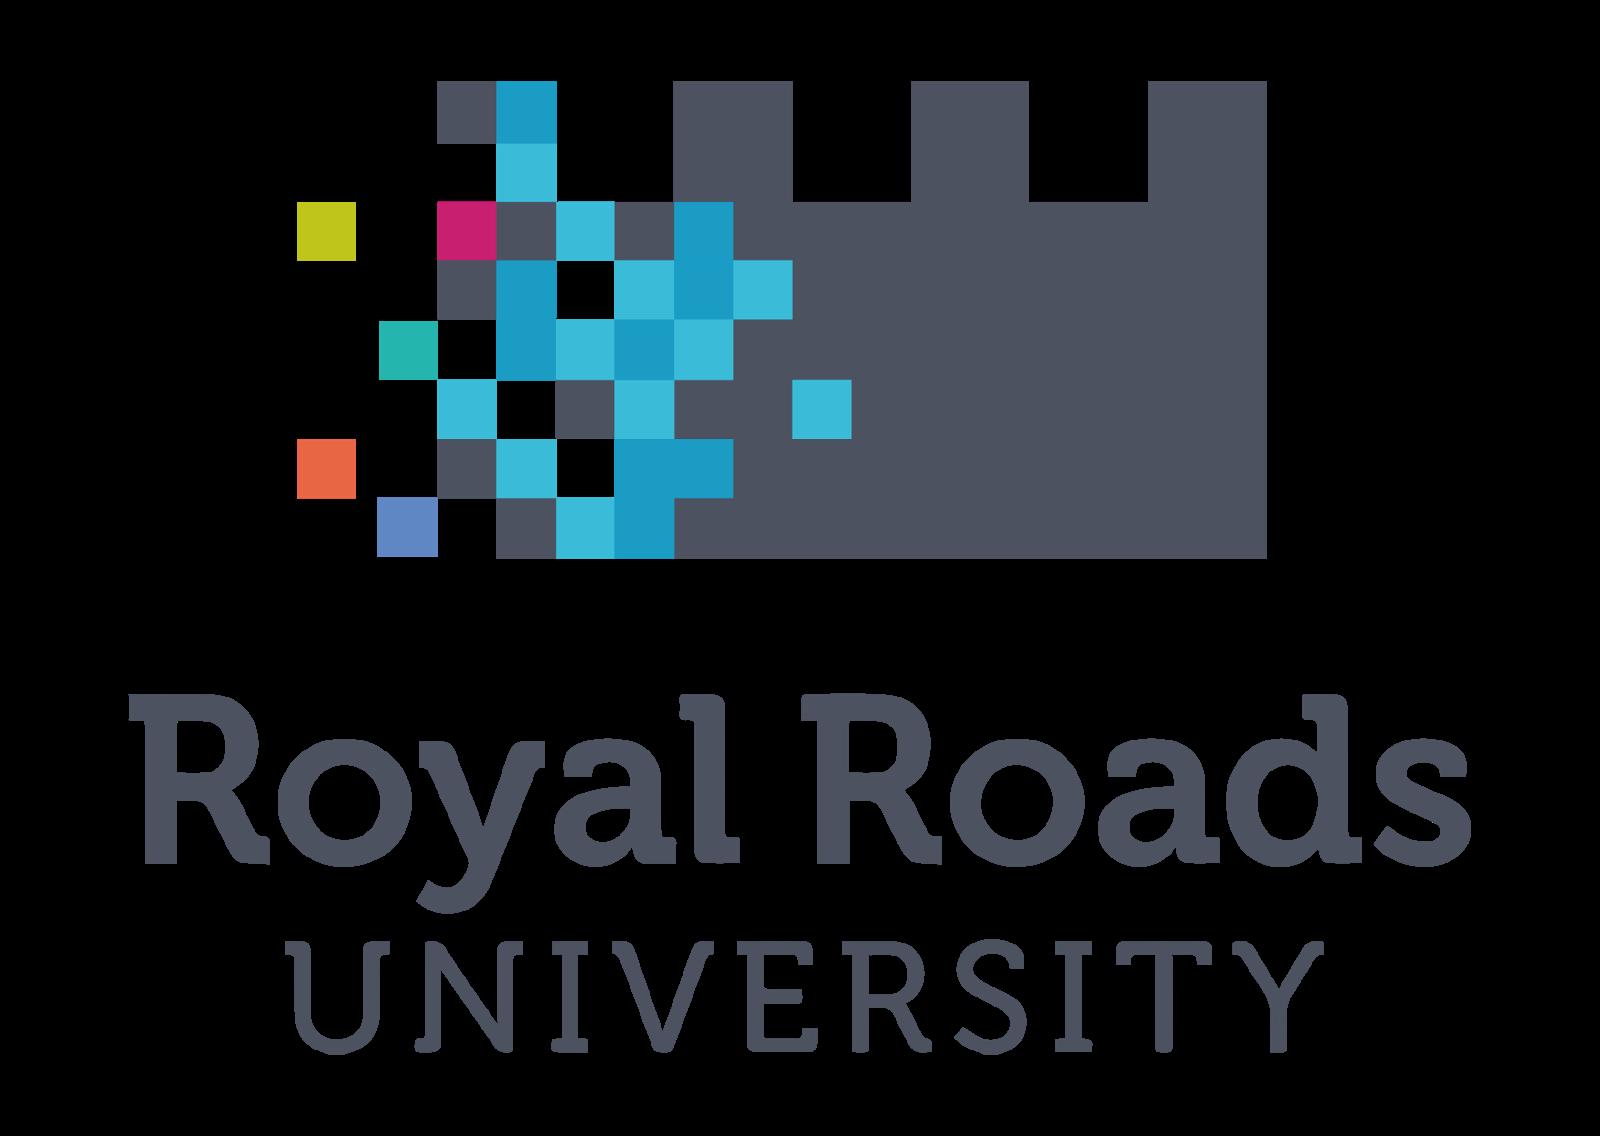 1600x1136 Royal Roads University Logo Vector~ Format Cdr, Ai, Eps, Svg, Pdf, Png